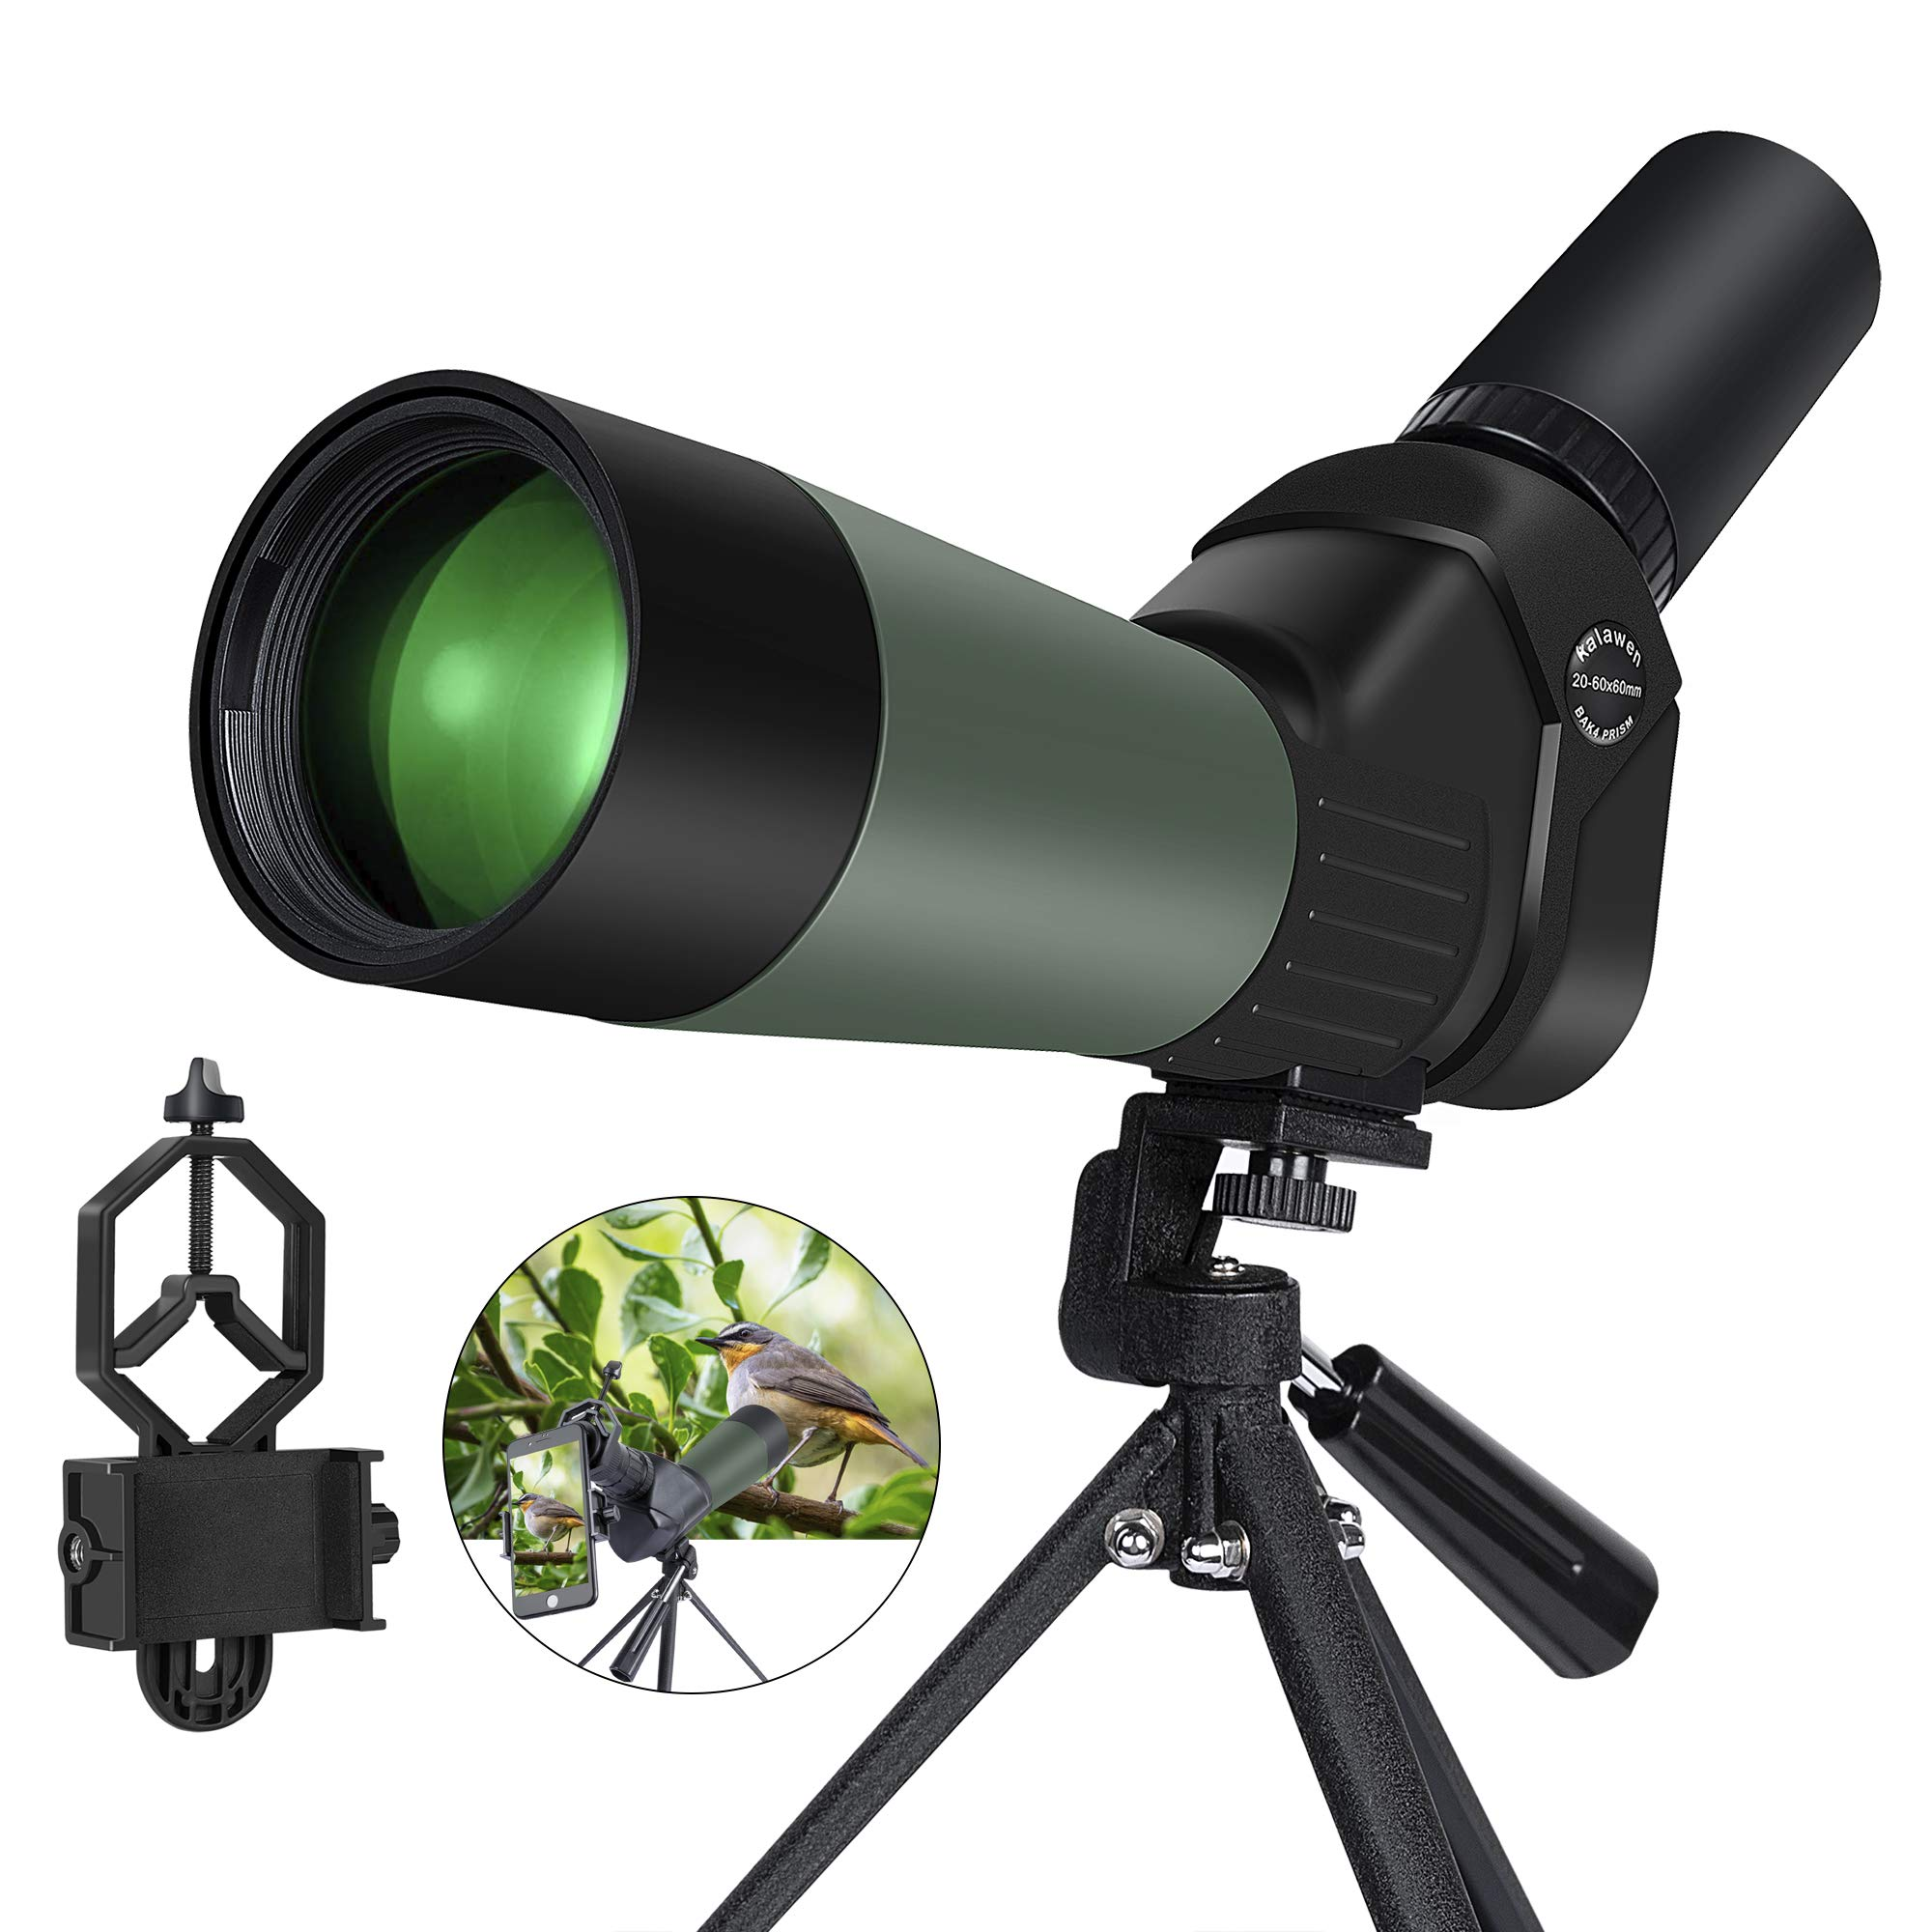 Kalawen 20-60x60 HD Spotting Scope with Tripod, Optics Zoom 57-120Ft/1000Yds BAK4 Angled Spotting Scope for Target Shooting, Hunting, Bird Watching, Wildlife Scenery by Kalawen